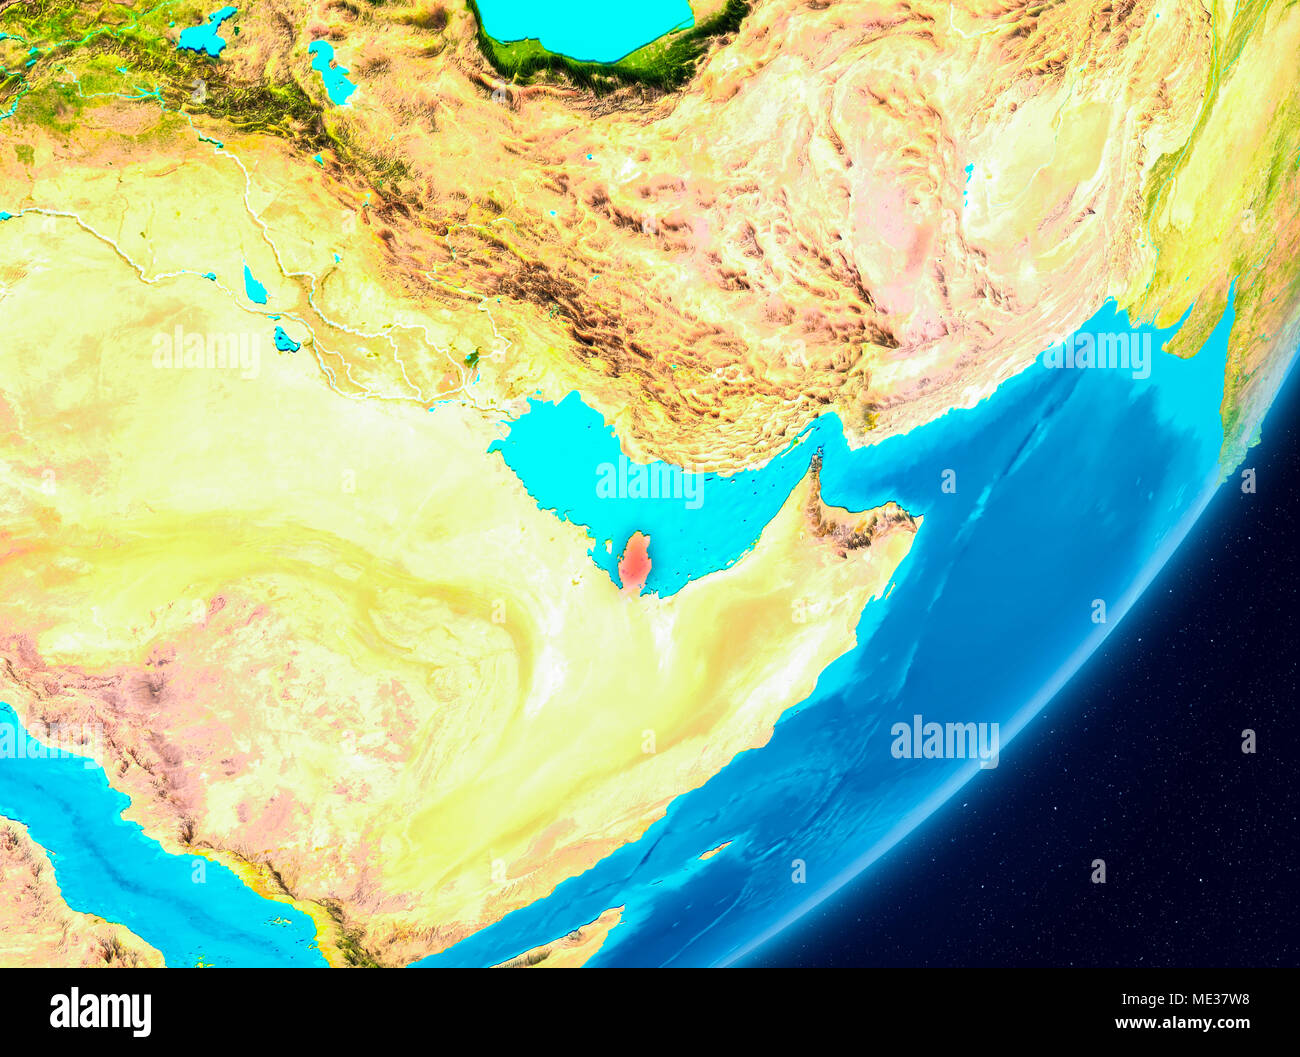 Qatar Map 3d Stock Photos & Qatar Map 3d Stock Images - Alamy